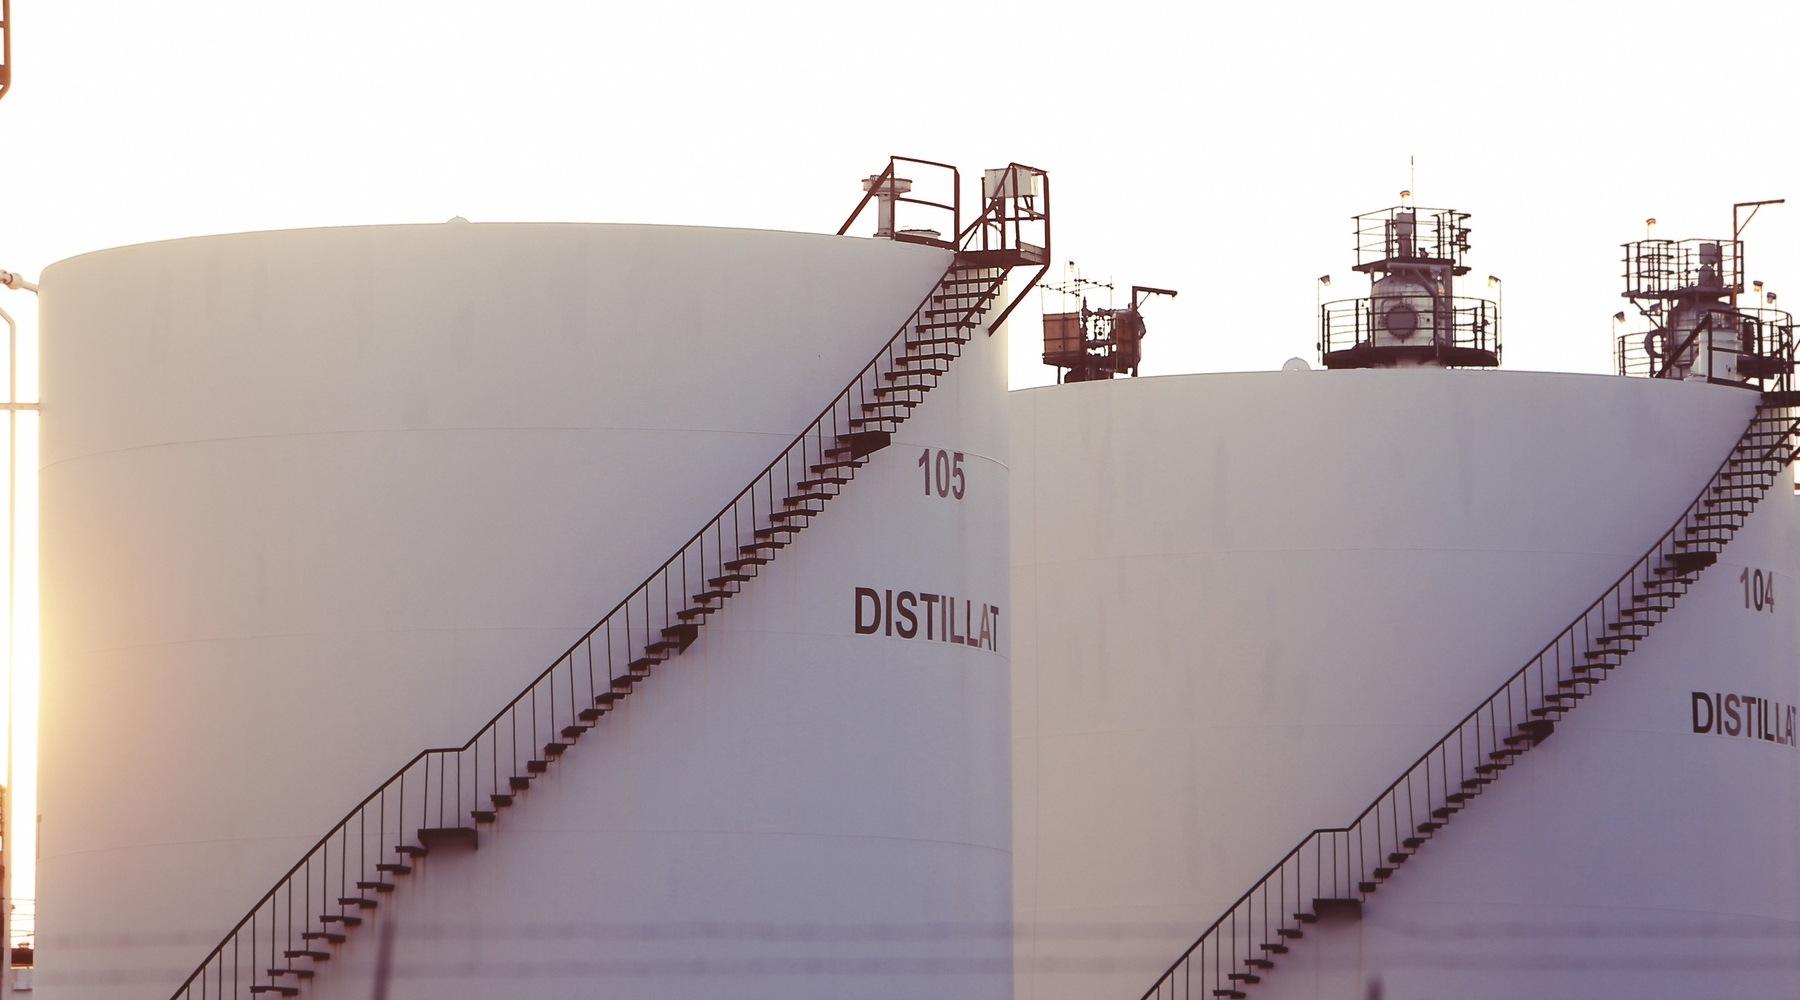 industry-fabric-silos-tanker